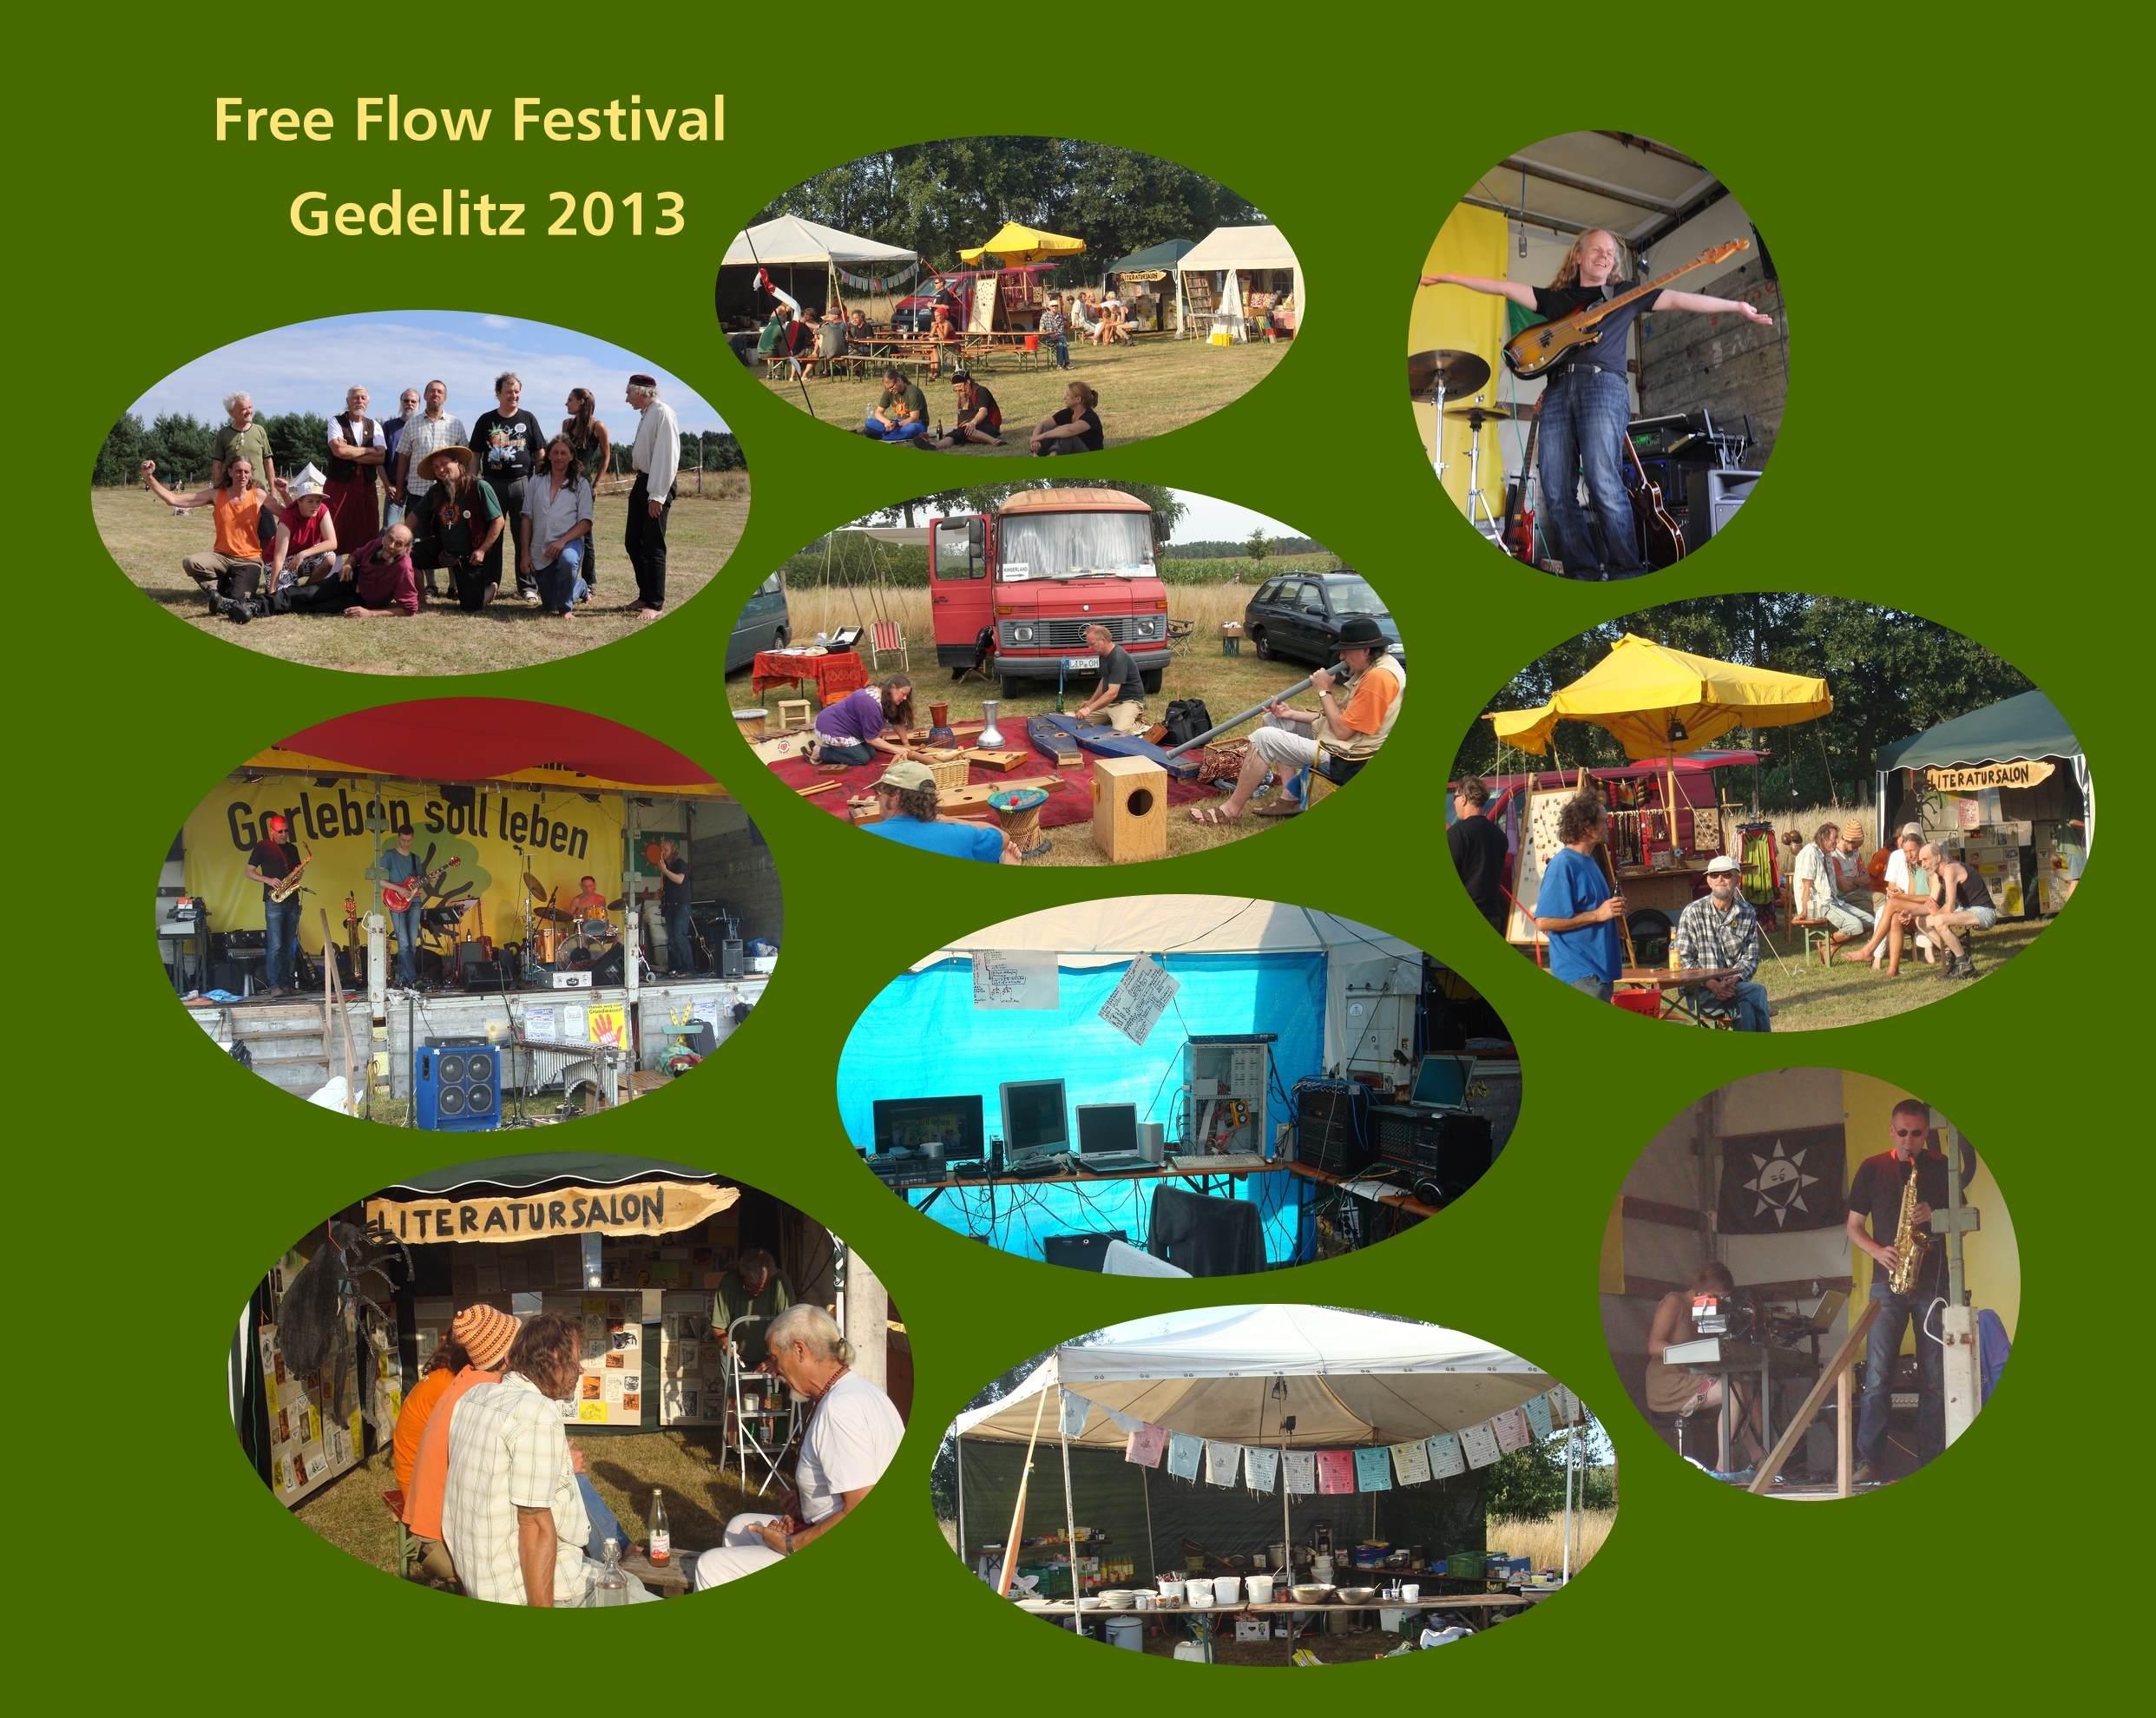 Free Flow Festival Gedelitz 2013